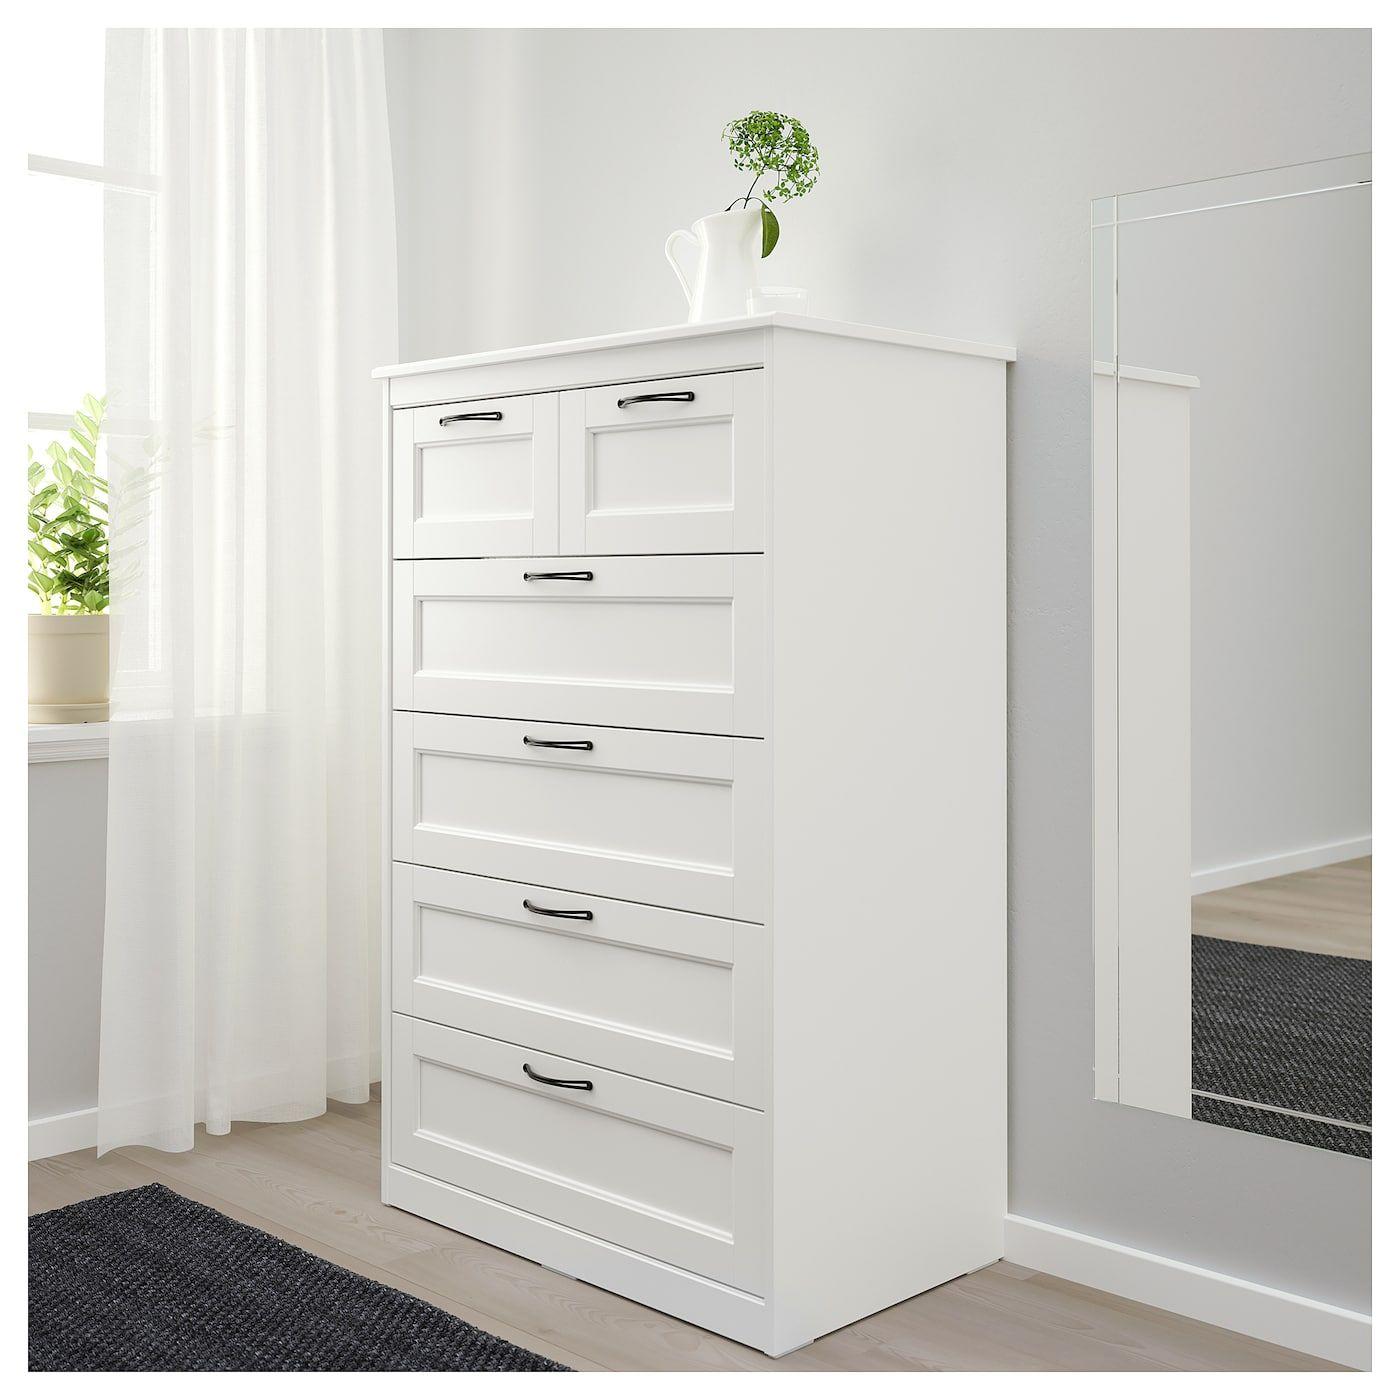 IKEA SONGESAND White 6drawer chest White bedroom